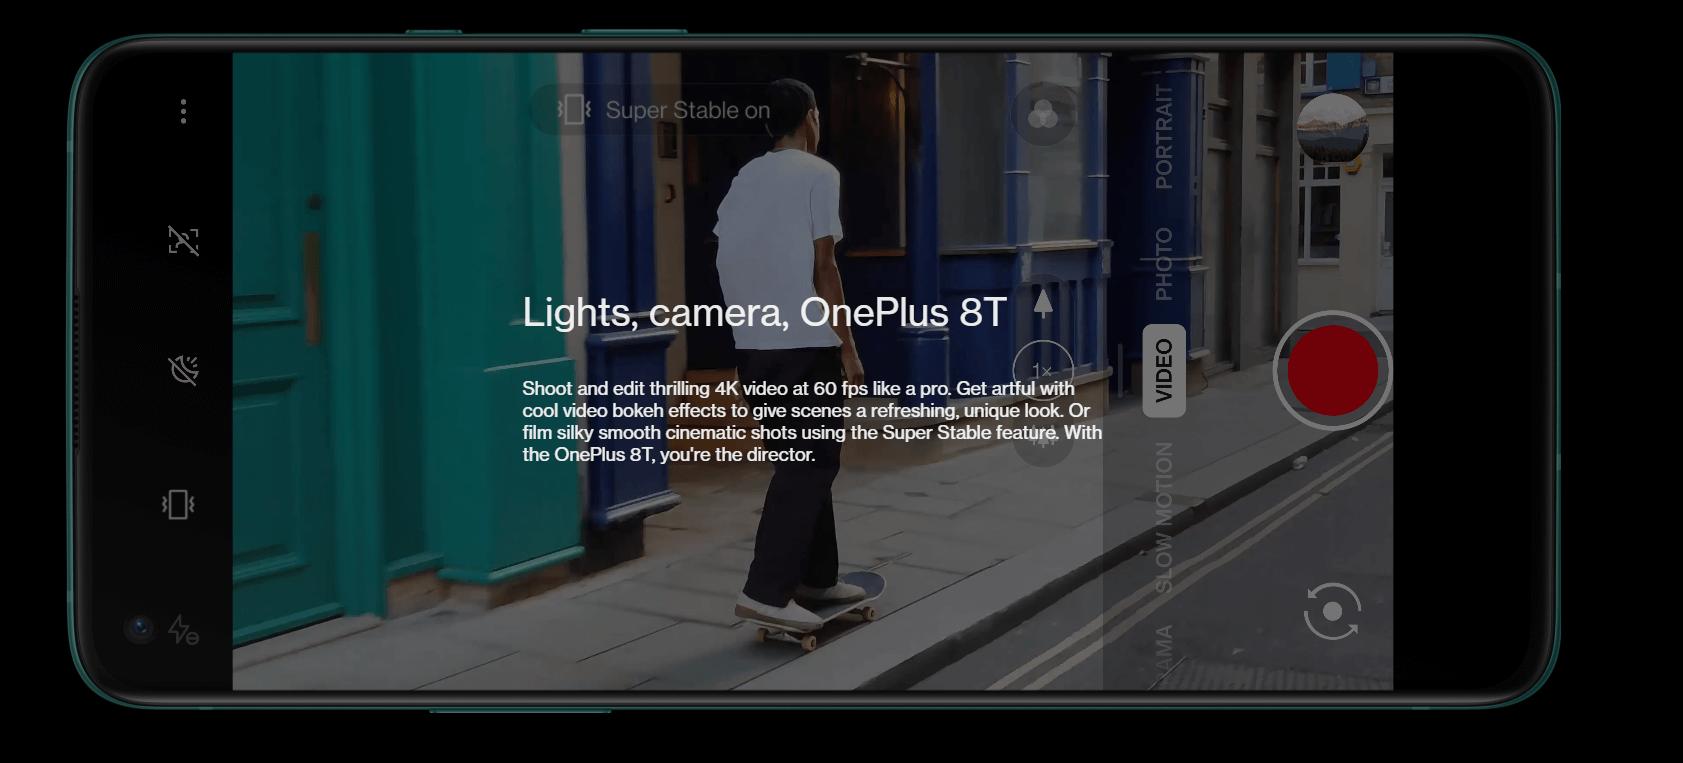 OnePlus 8T flash